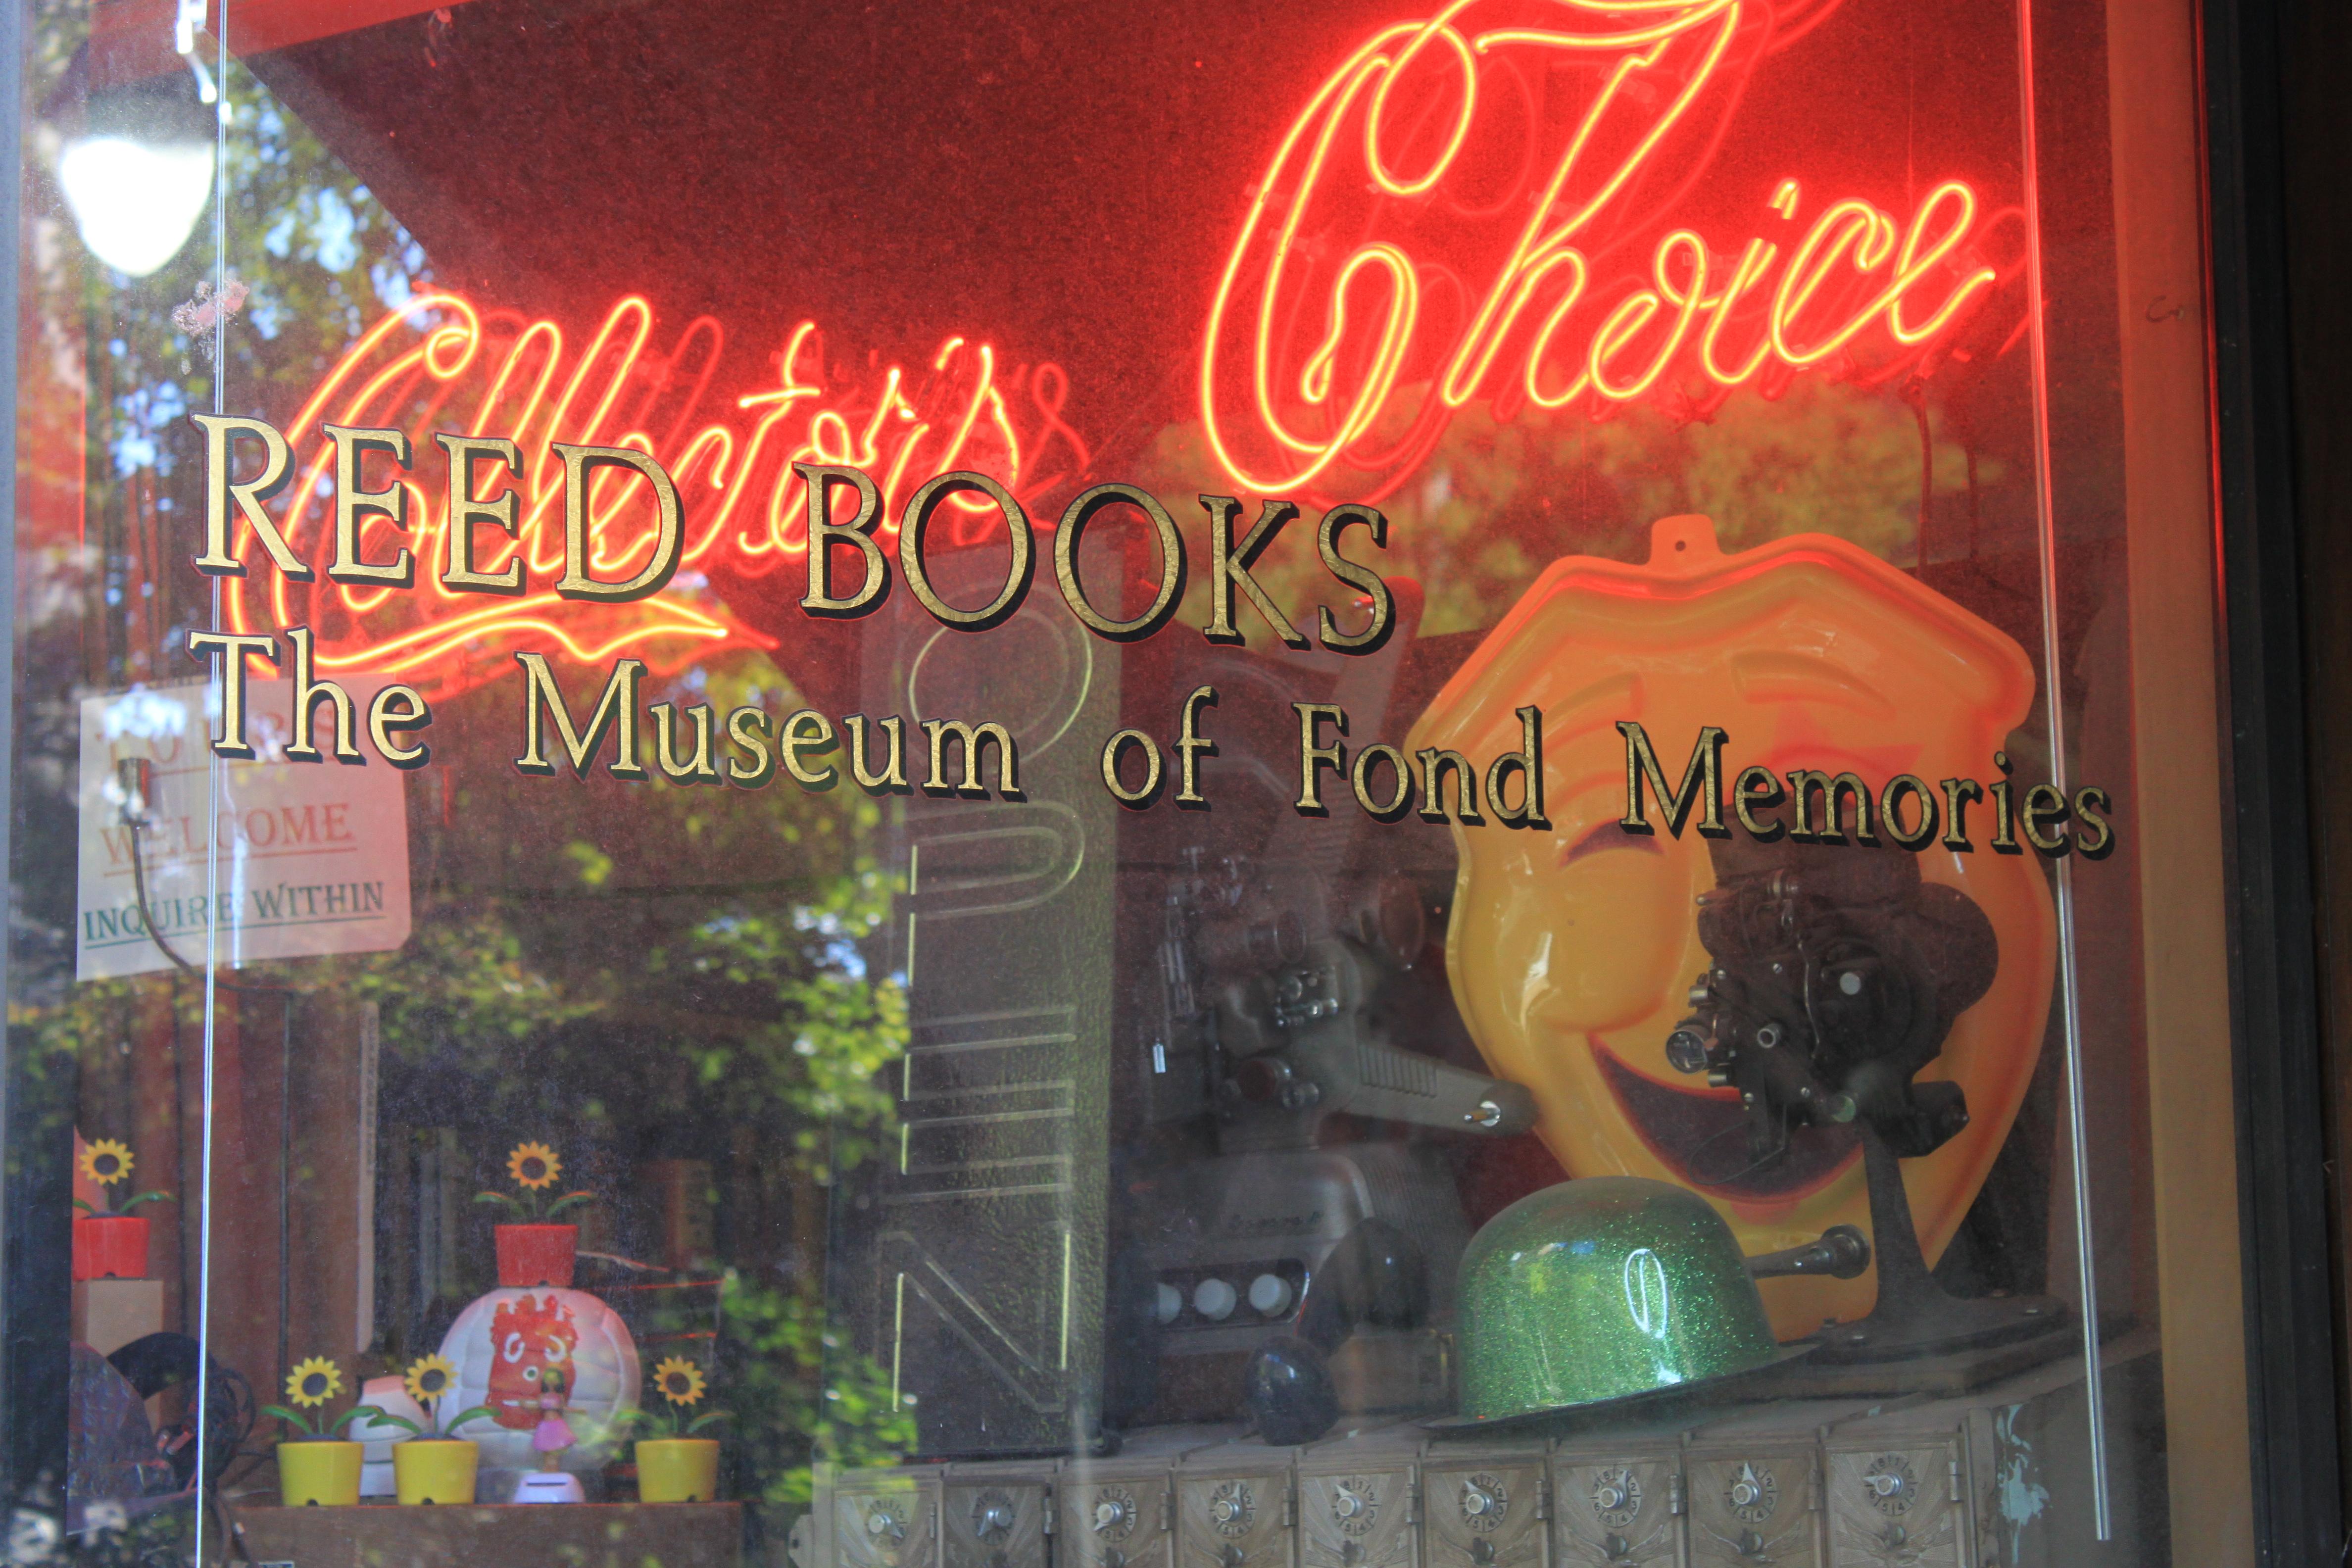 Reed Books: Museum of Fond Memories